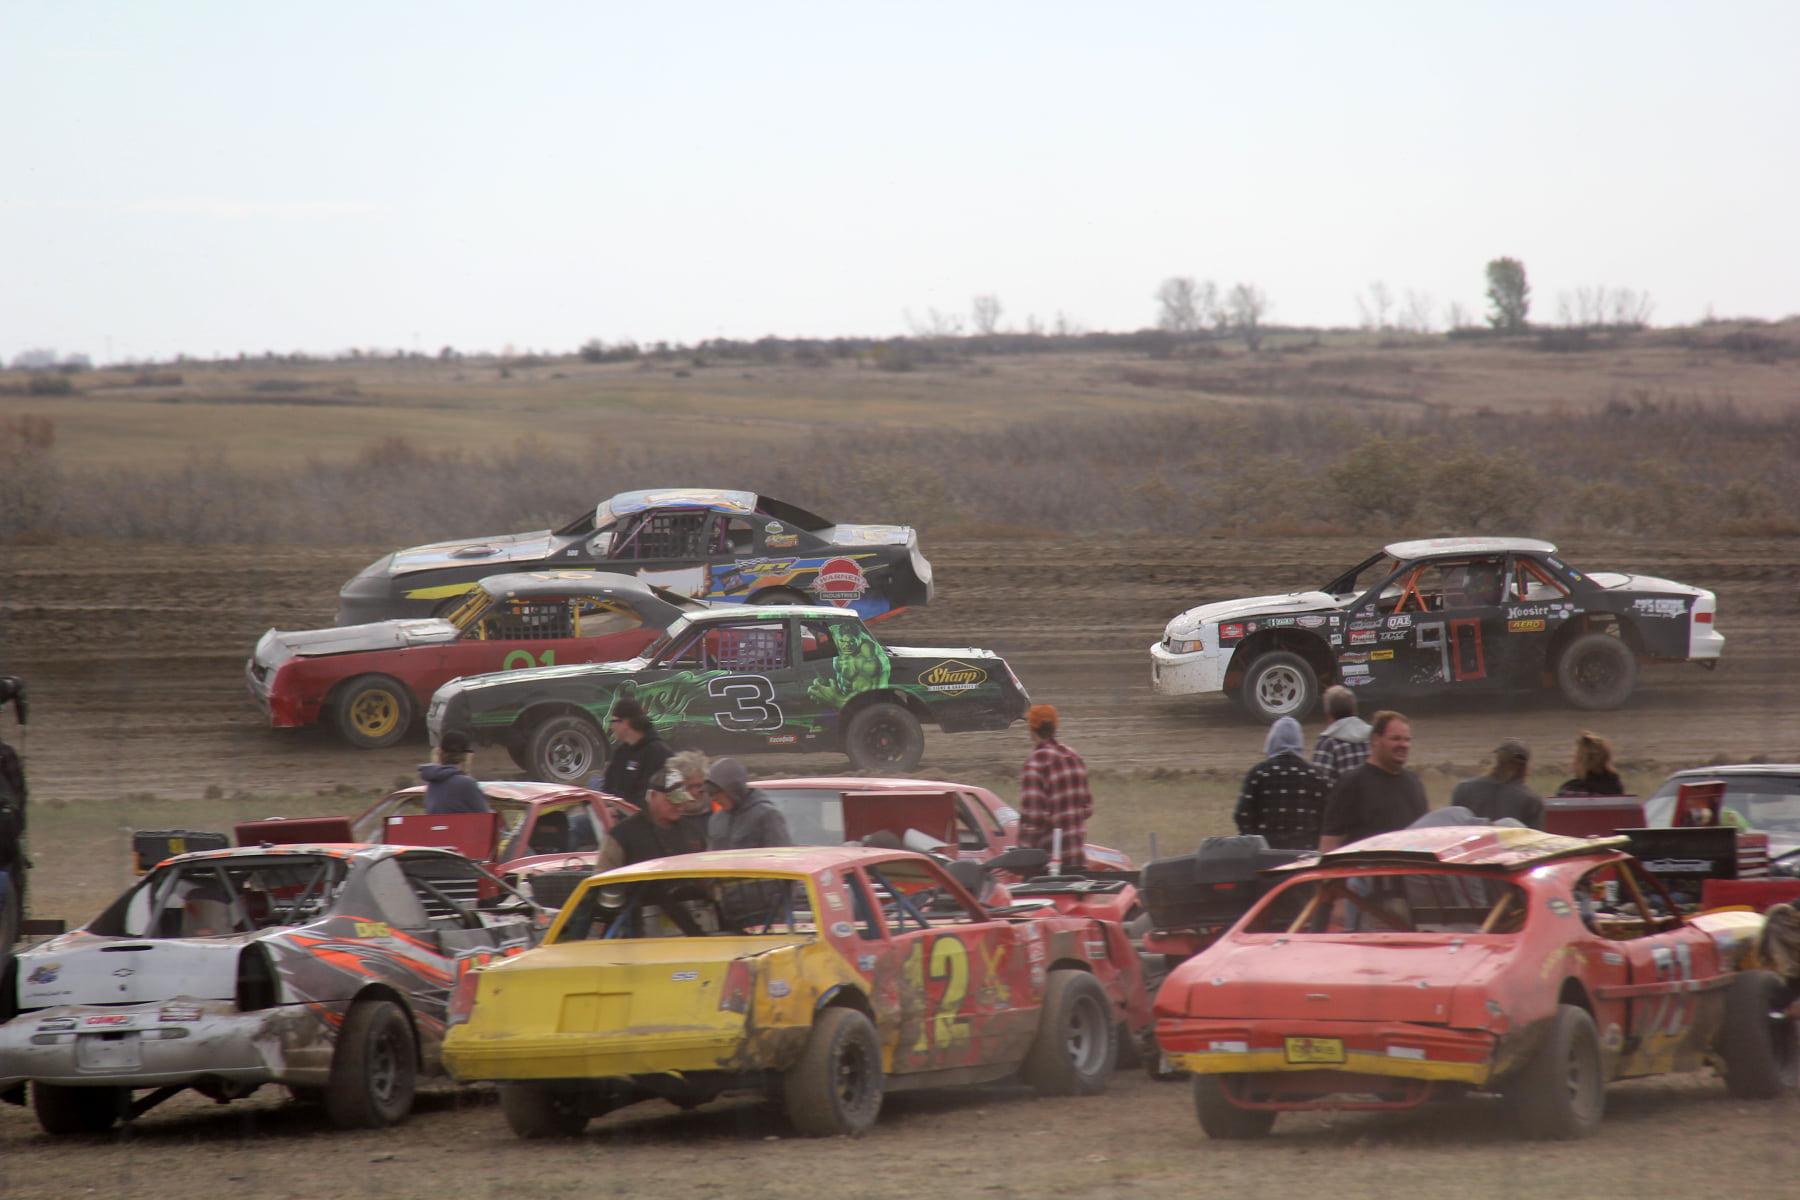 Outlook_Racing_Kemmer_Racing_Photography_25.jpg